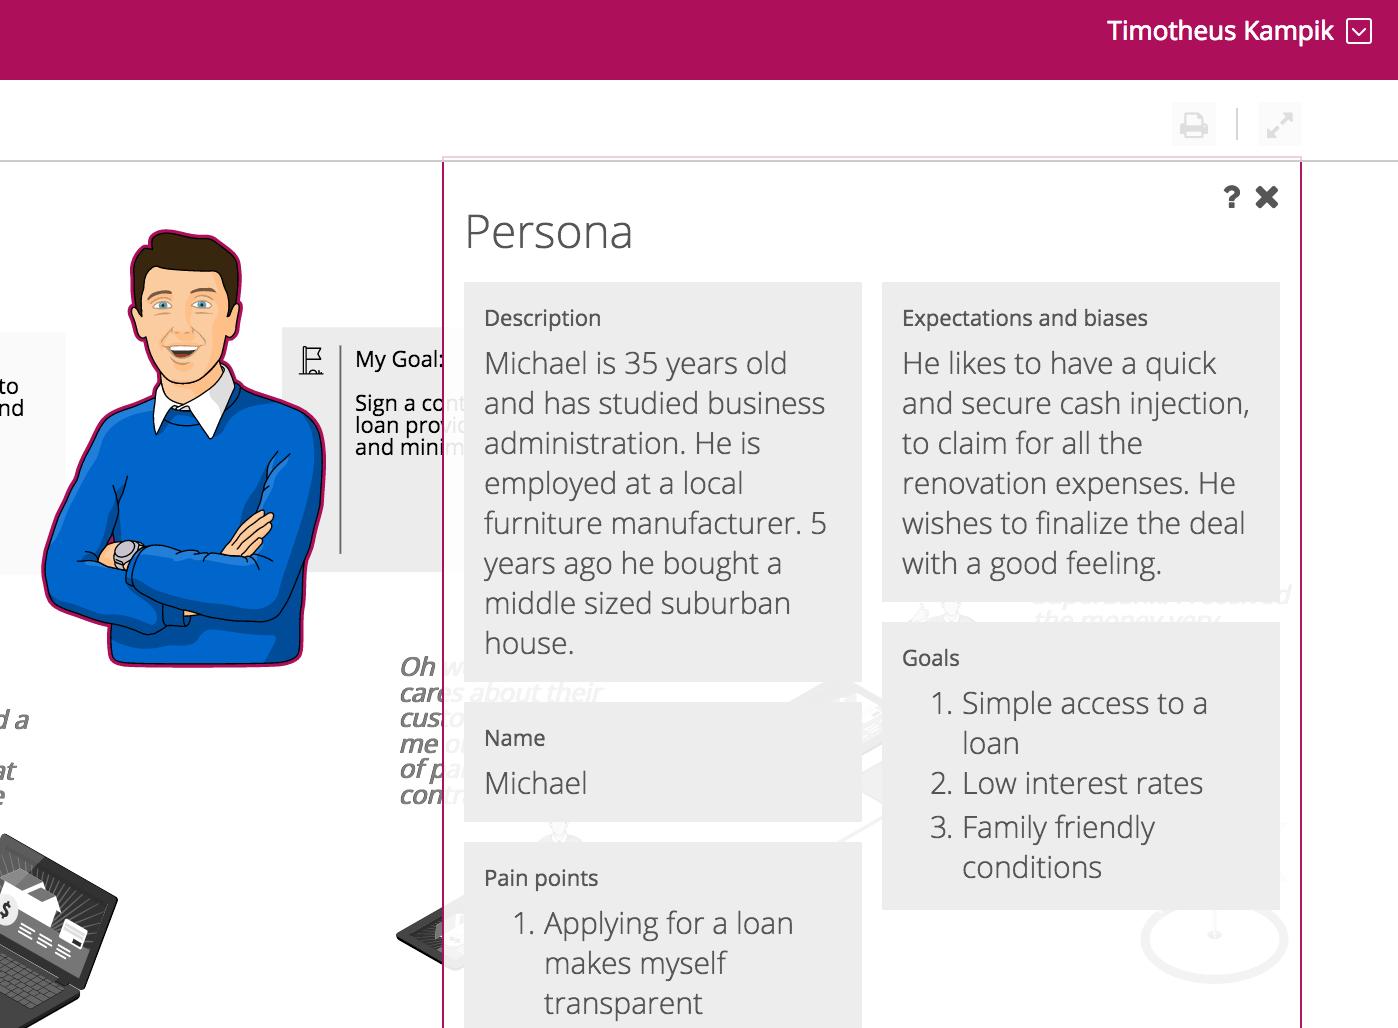 Customer journey maps: persona